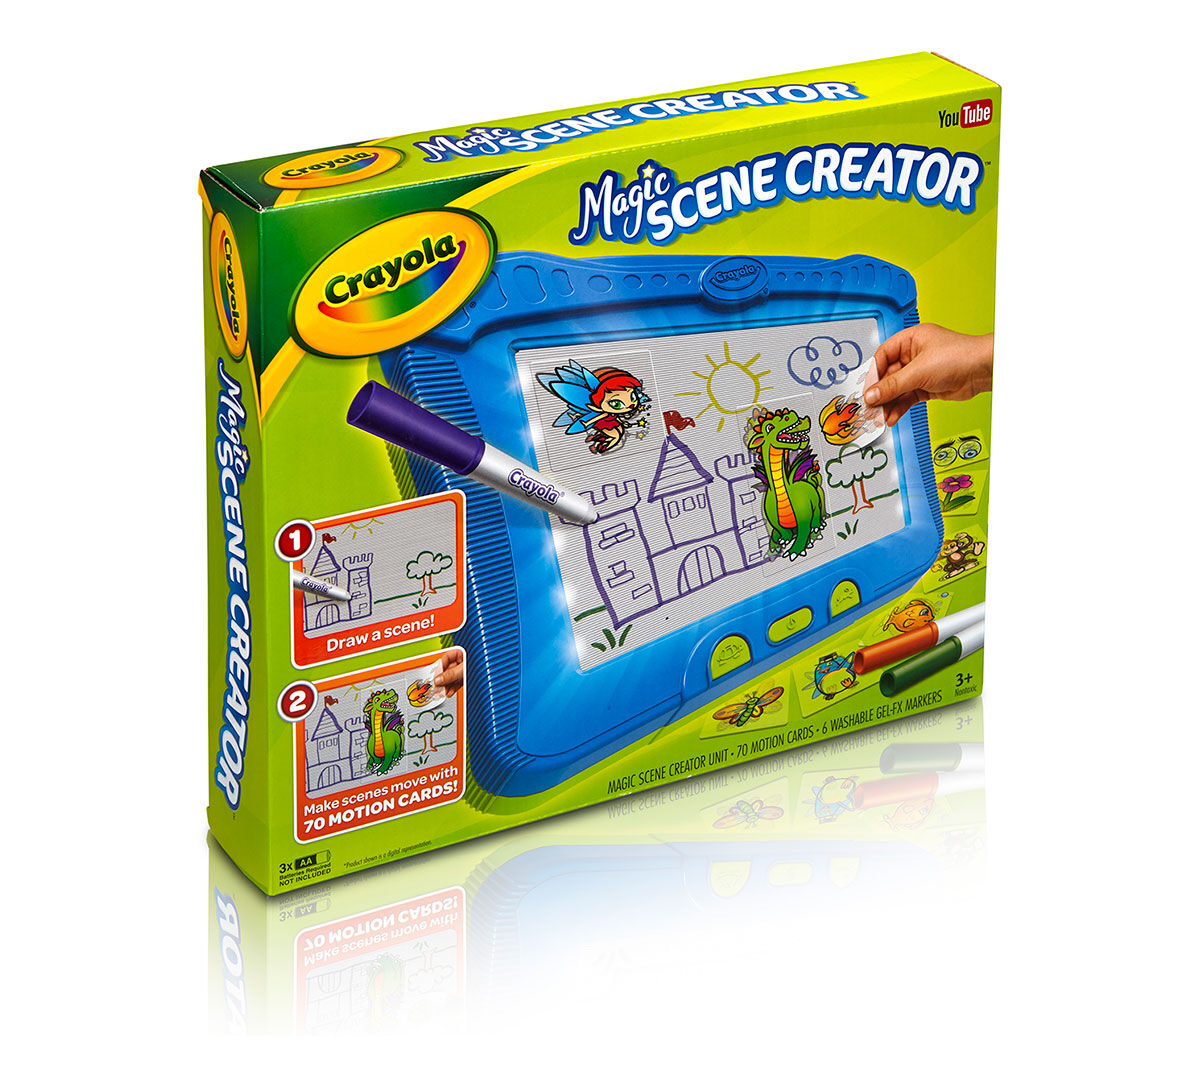 Crayola Magic Scene Creator Creative Activity Toy Turn Pictures